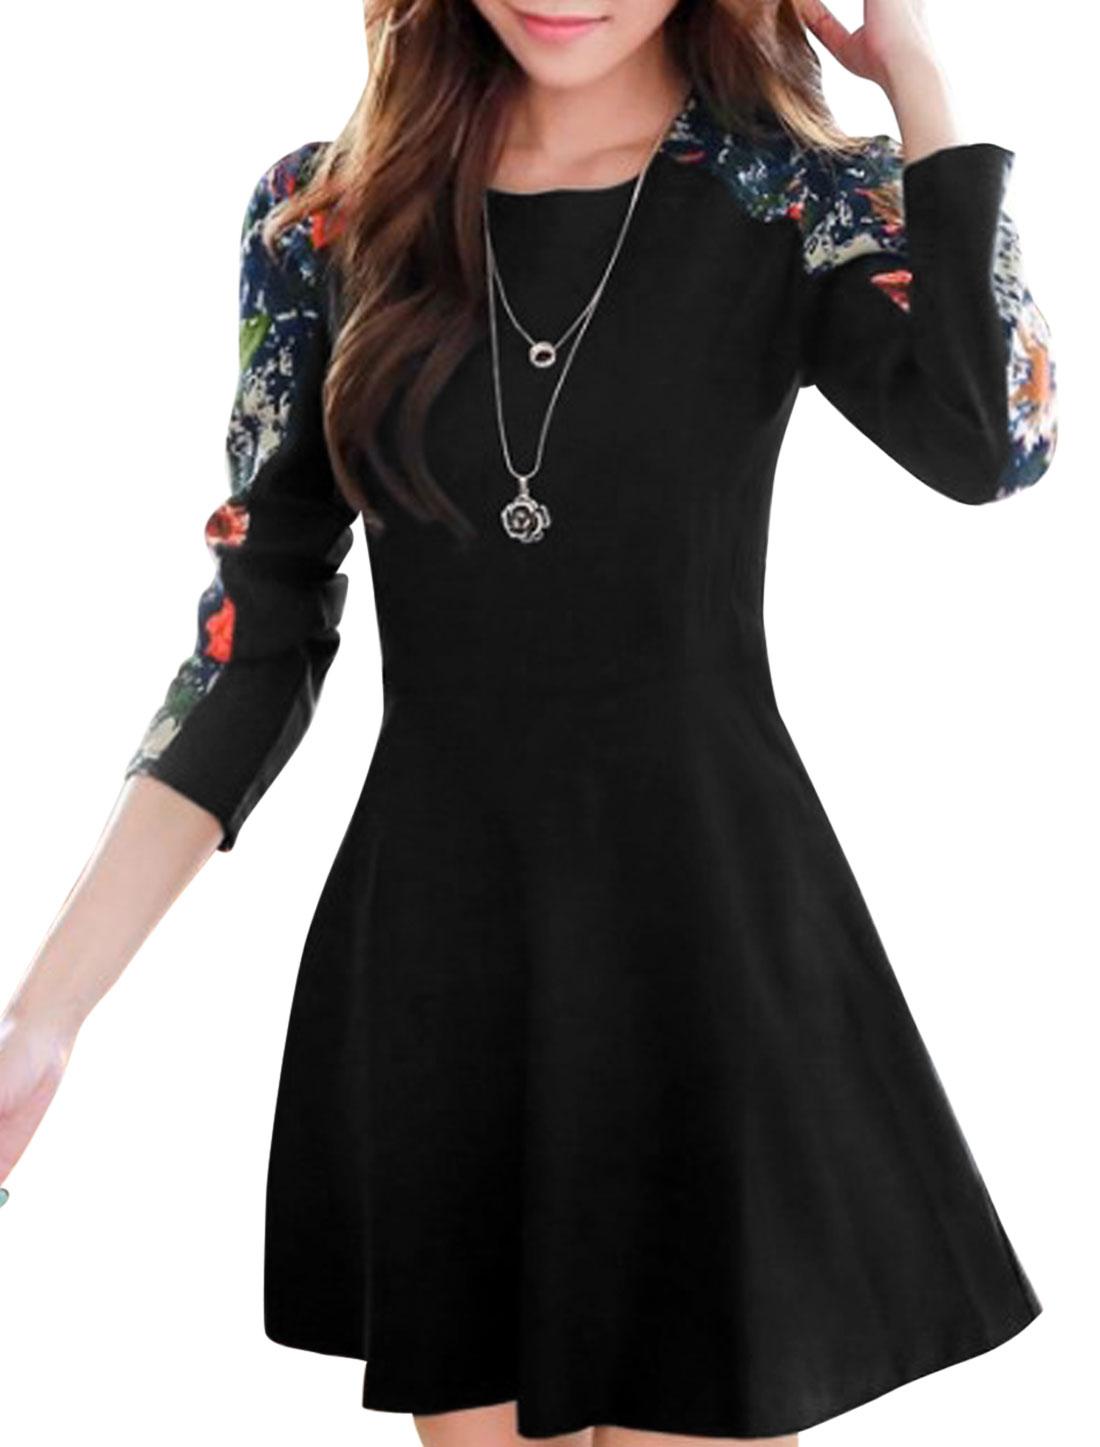 Women Spliced Floral Pattern Round Neck Long Sleeve Short Dress Black M